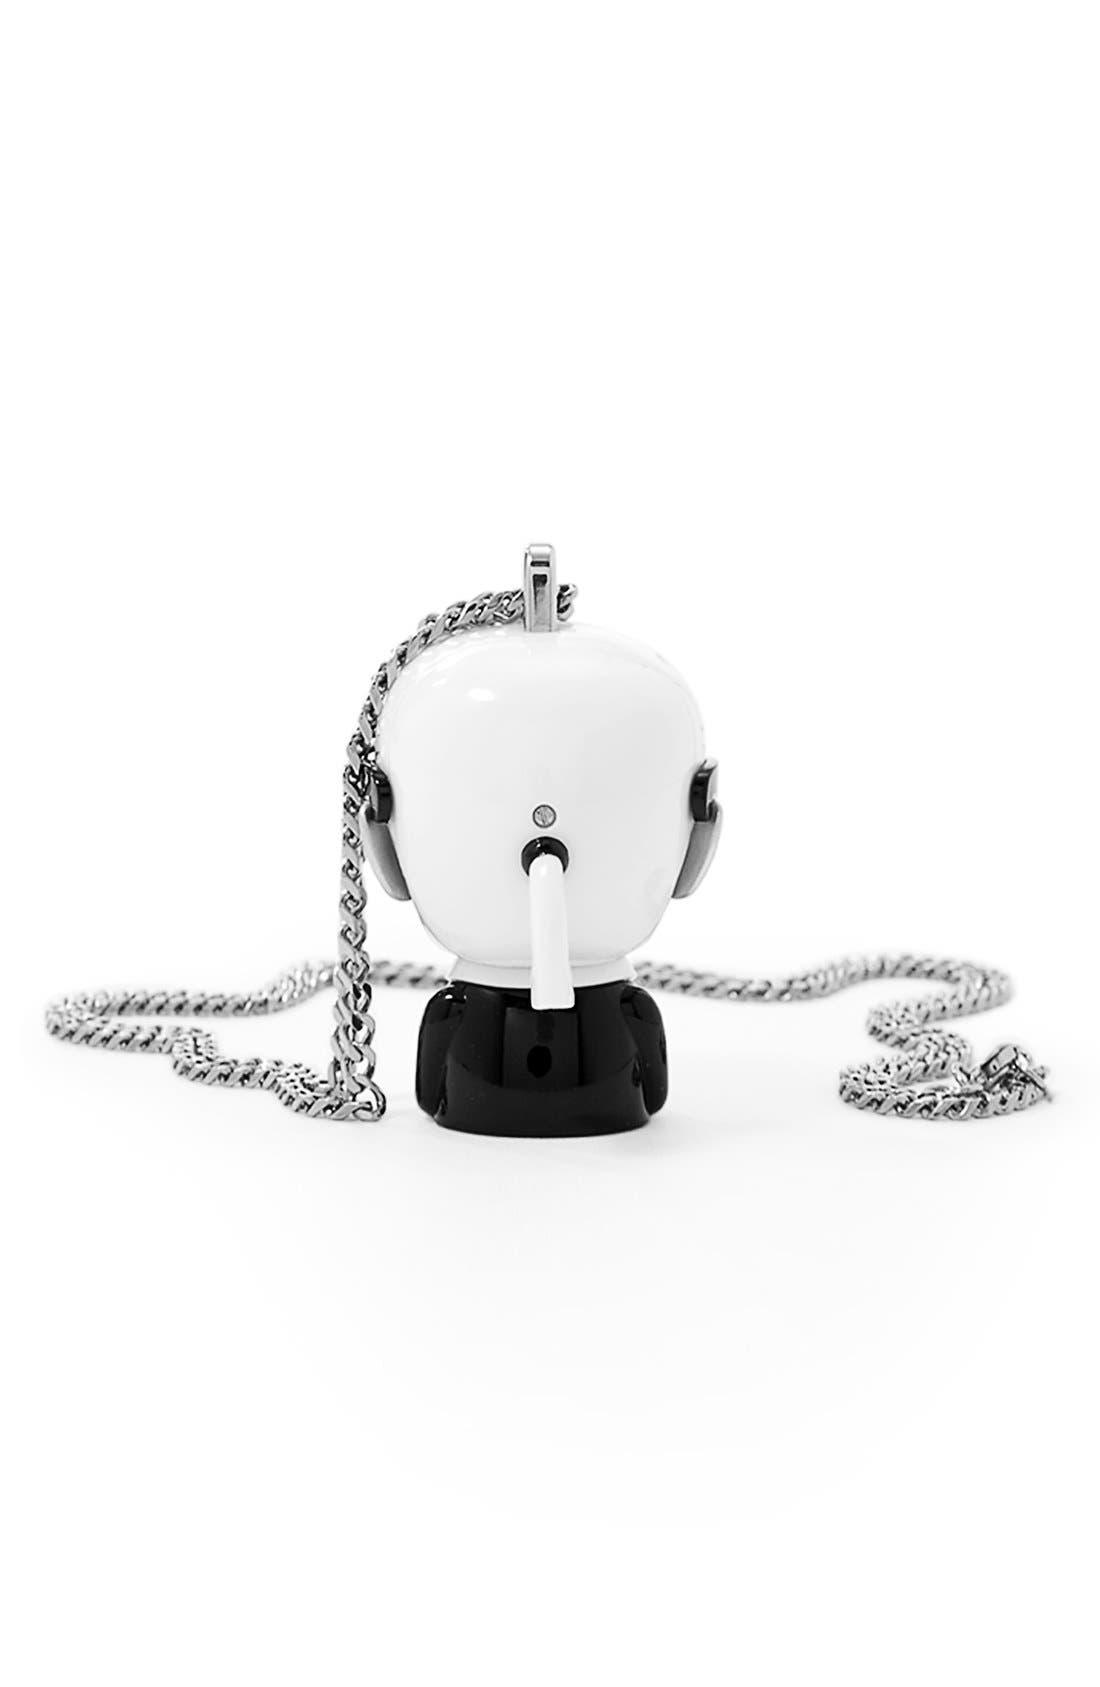 KARL LAGERFELD 'tokidoki' Digital Necklace Watch, 37mm x 51mm,                             Alternate thumbnail 2, color,                             040